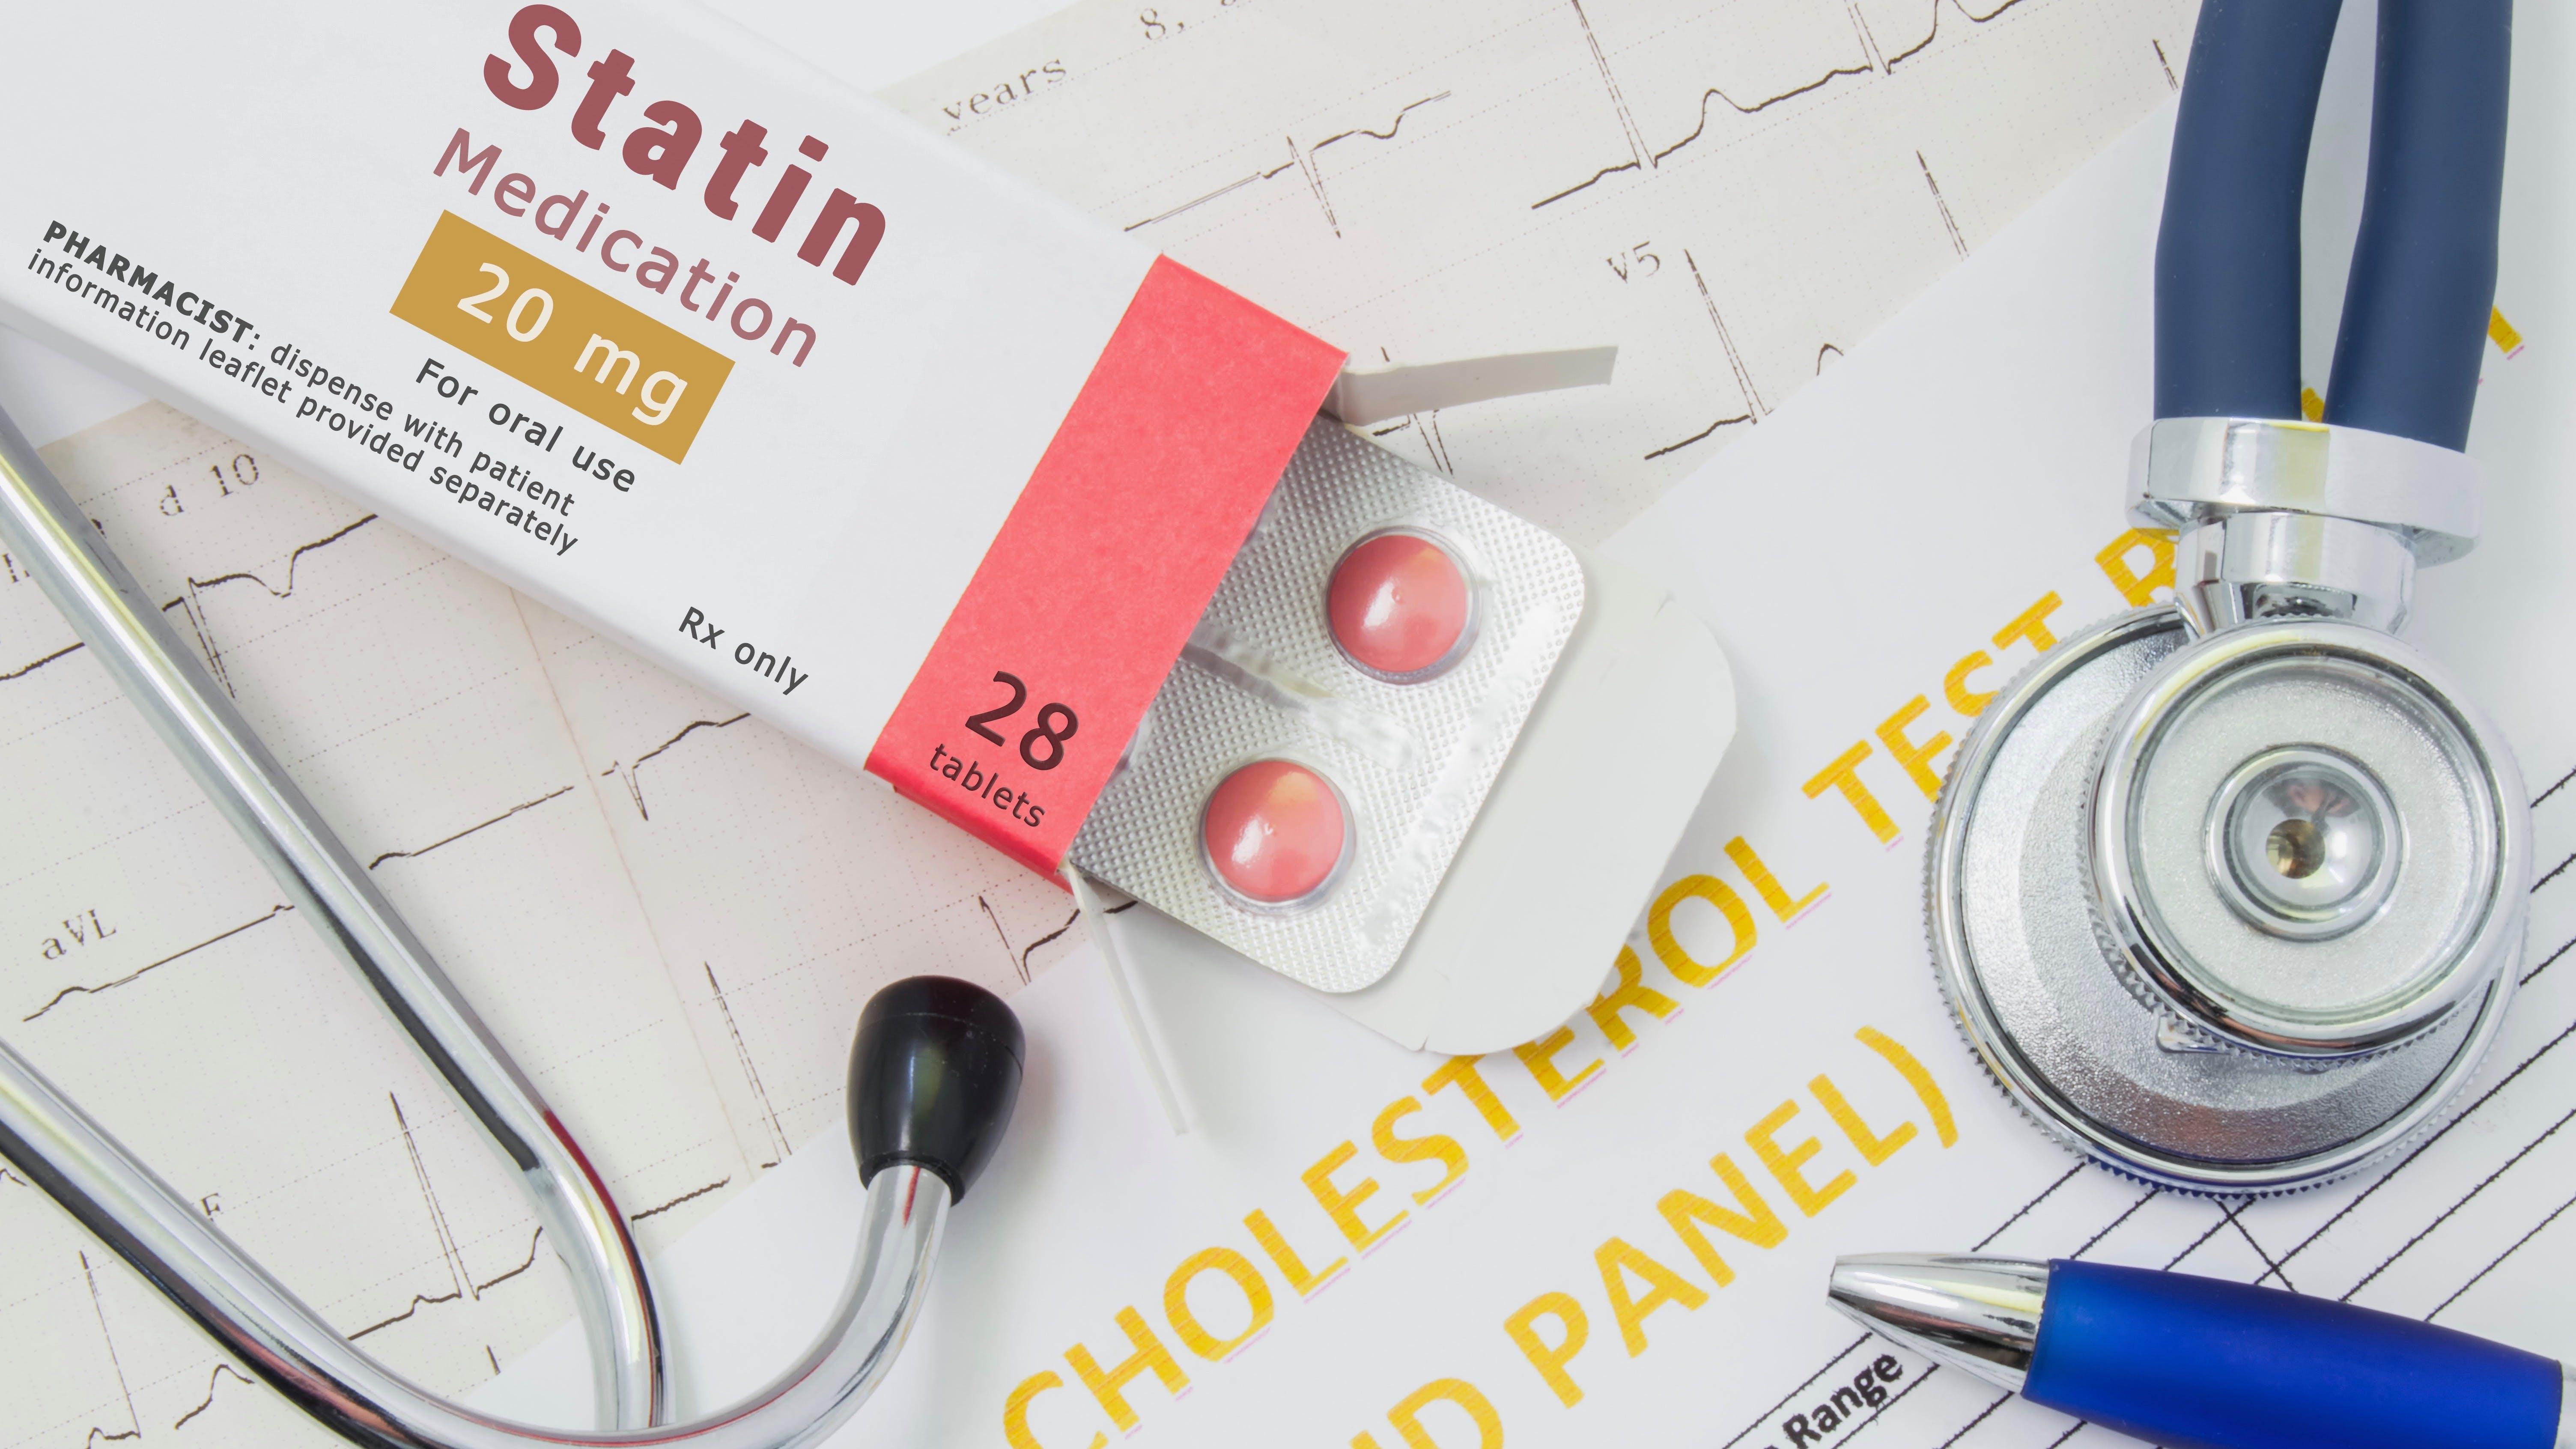 The bitter statin debate